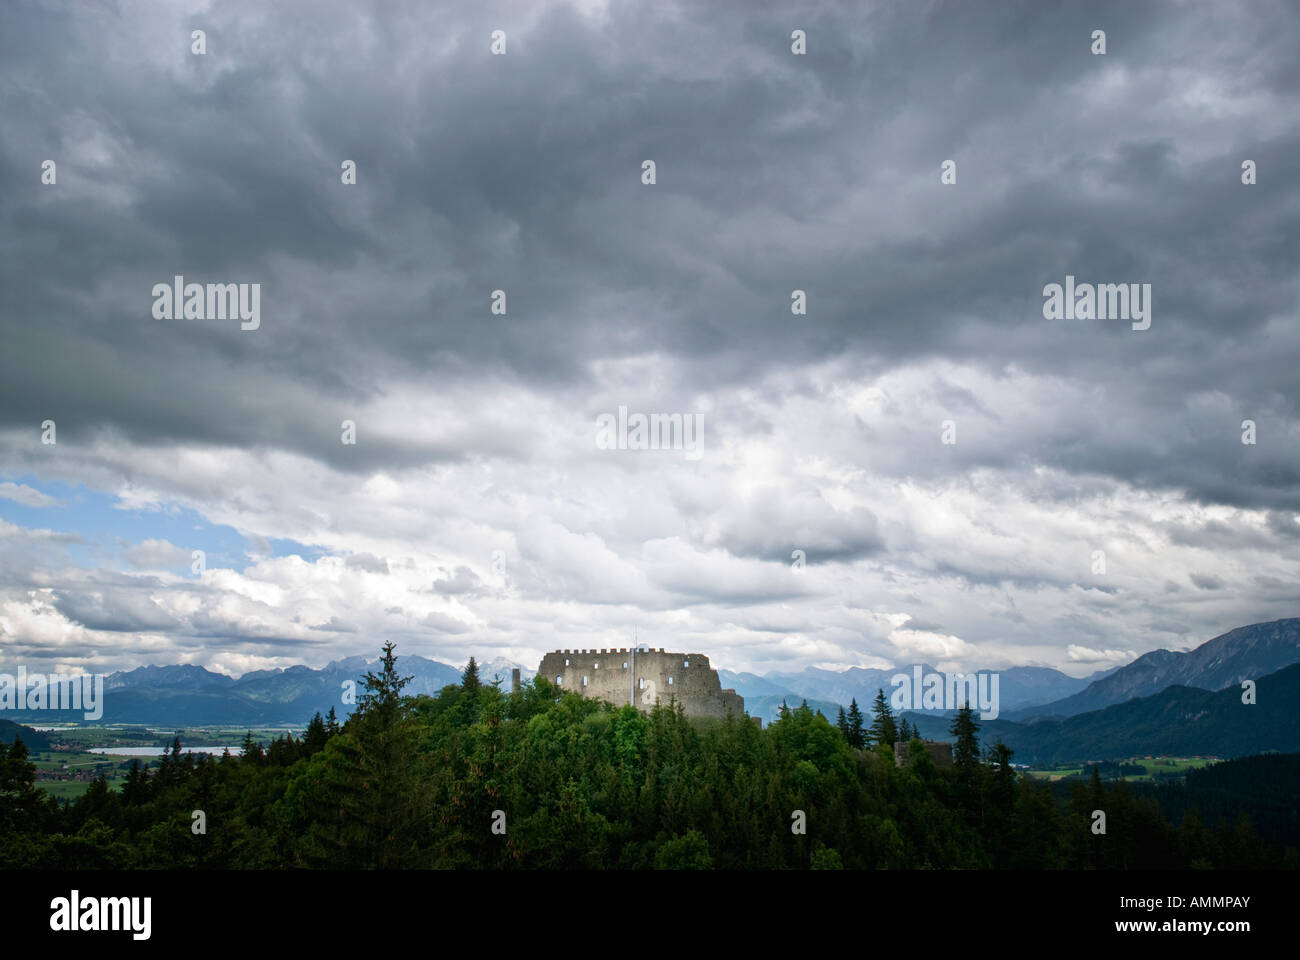 Stormy skies over the ruin of Burg Eisenberg castle, Eisenberg, Ostallgäu, Bavaria, Germany - Stock Image